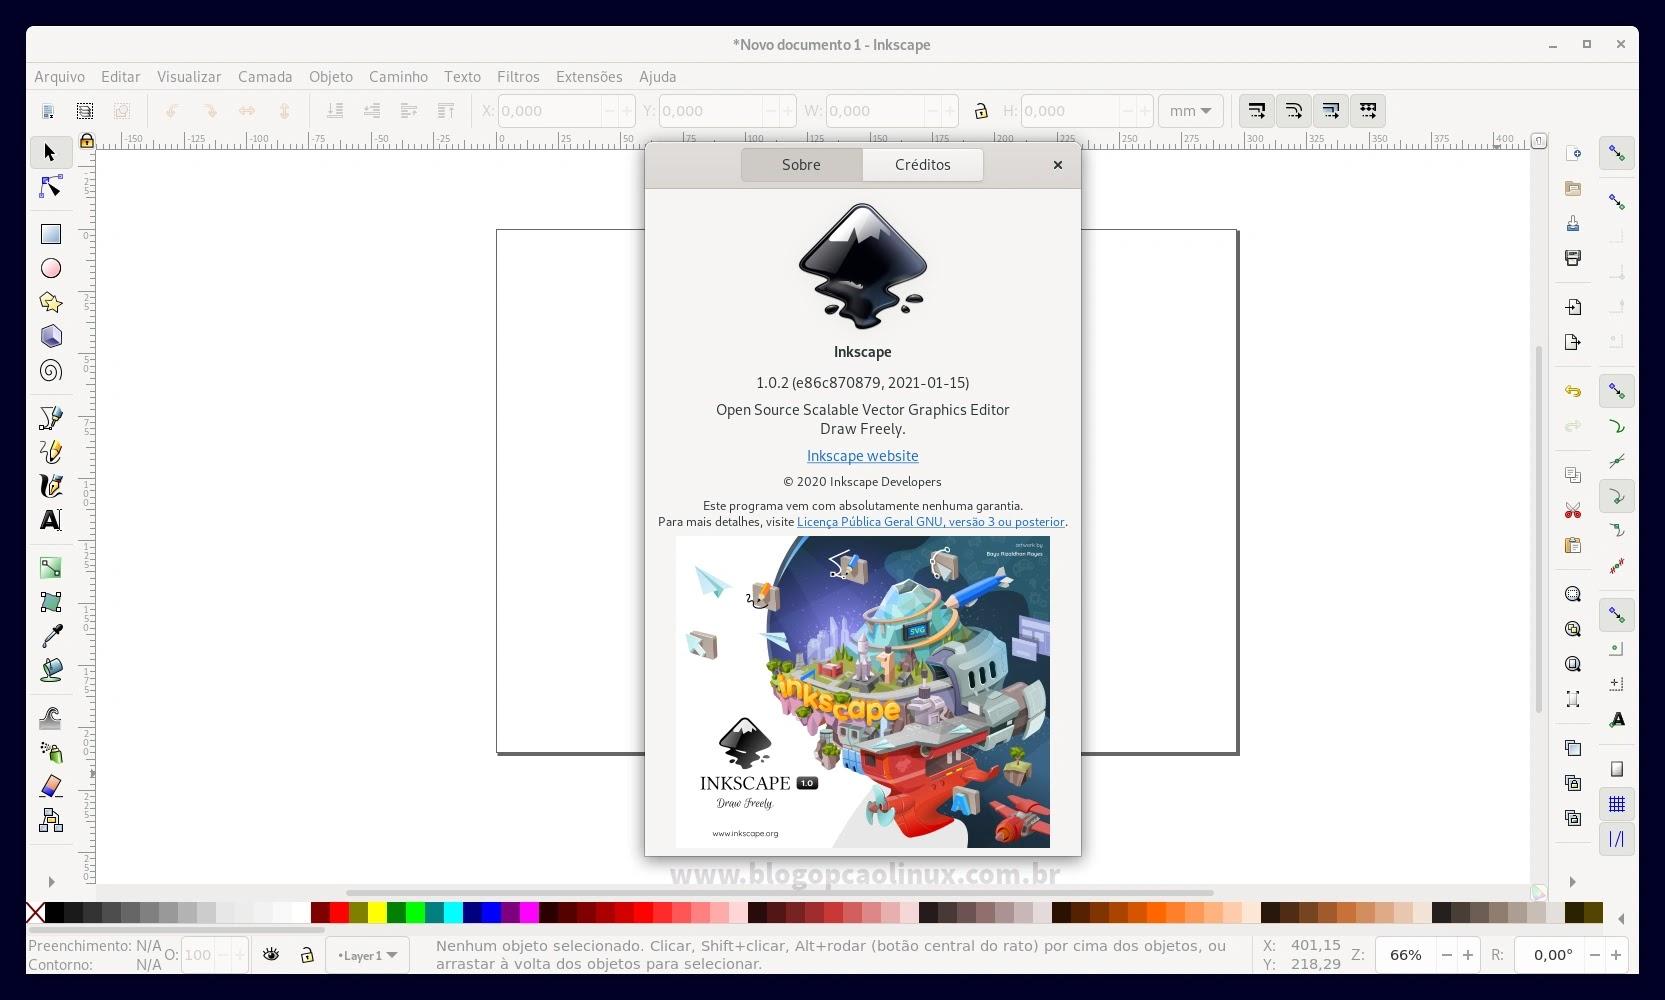 Inkscape executando no Debian 11 Bullseye